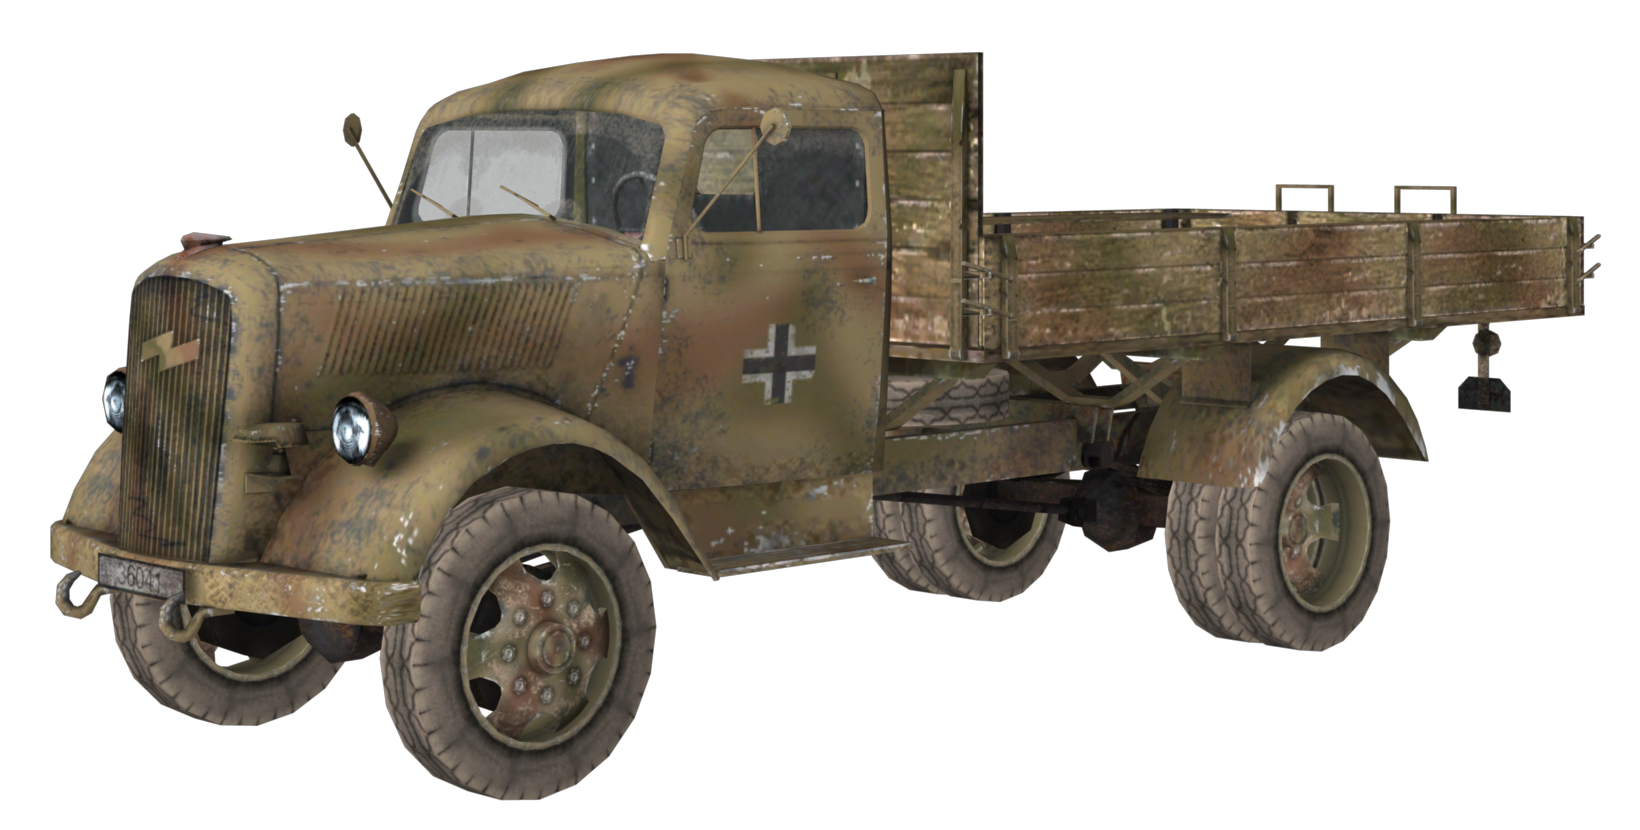 Opel Blitz Call Of Duty Wiki Fandom Powered By Wikia